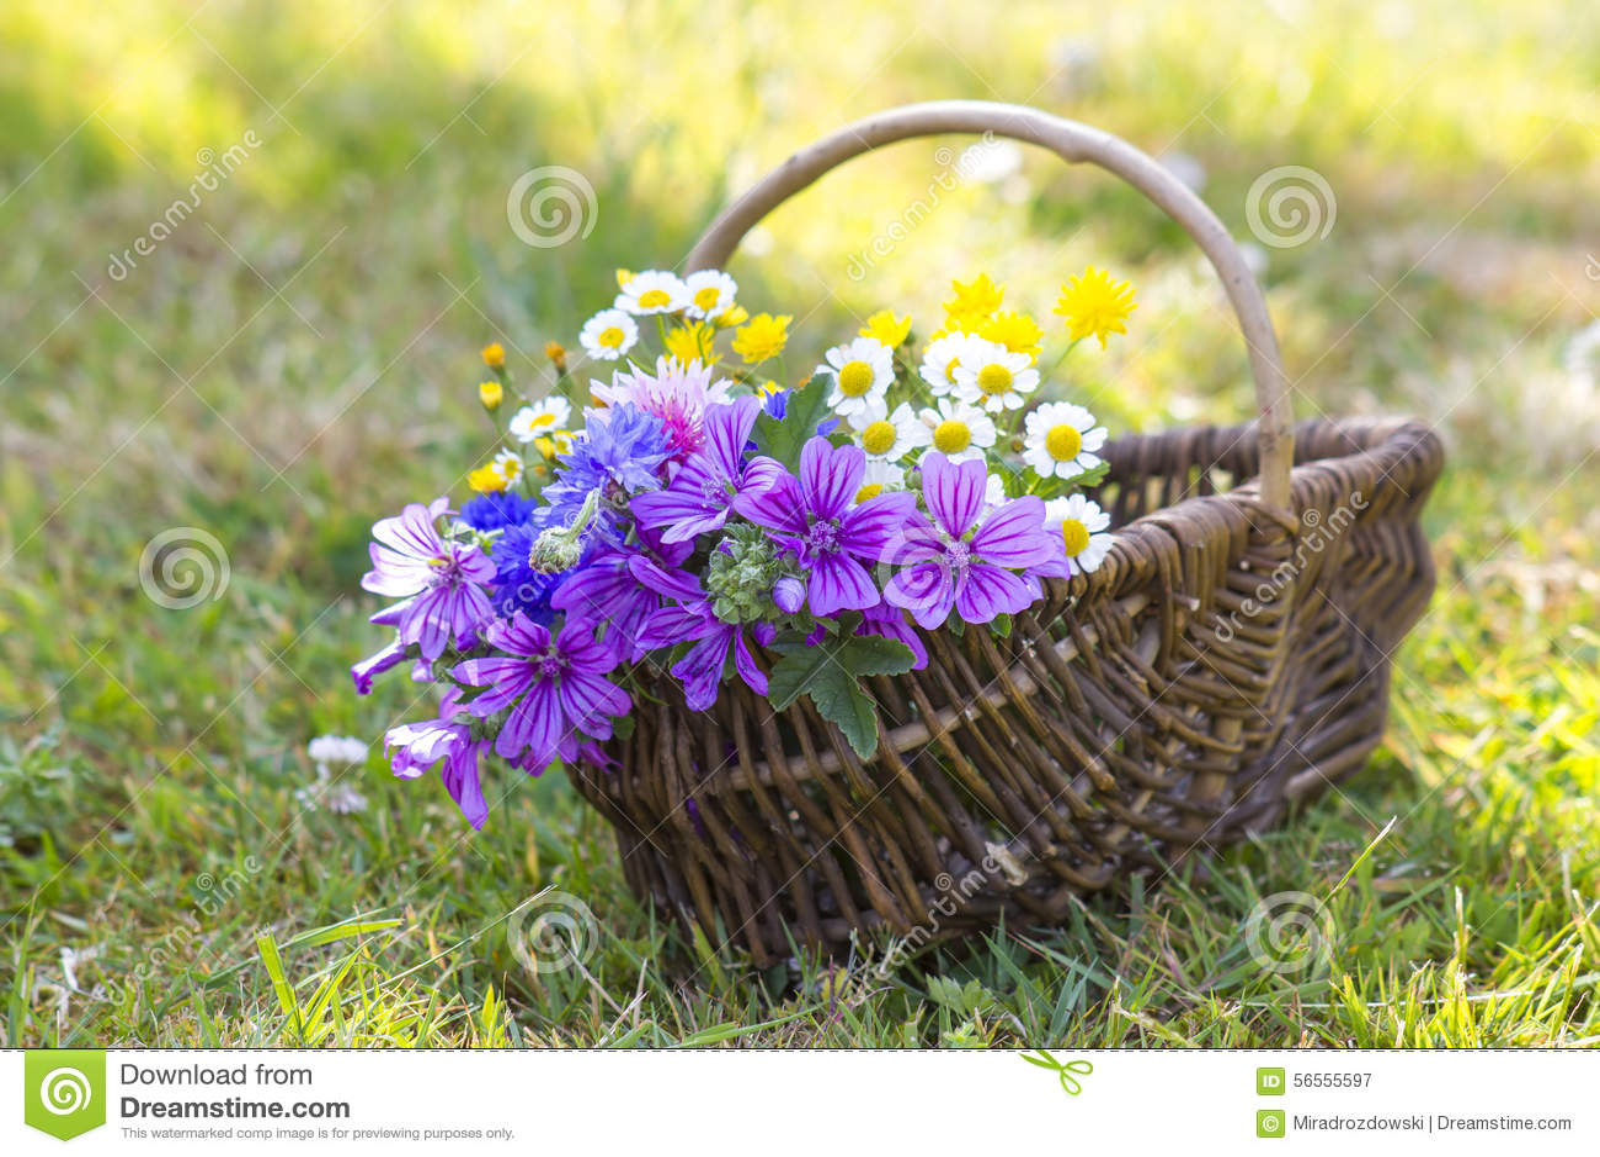 Download Wildflowers σε ένα καλάθι στοκ εικόνα. εικόνα από ζωηρόχρωμος - 56555597